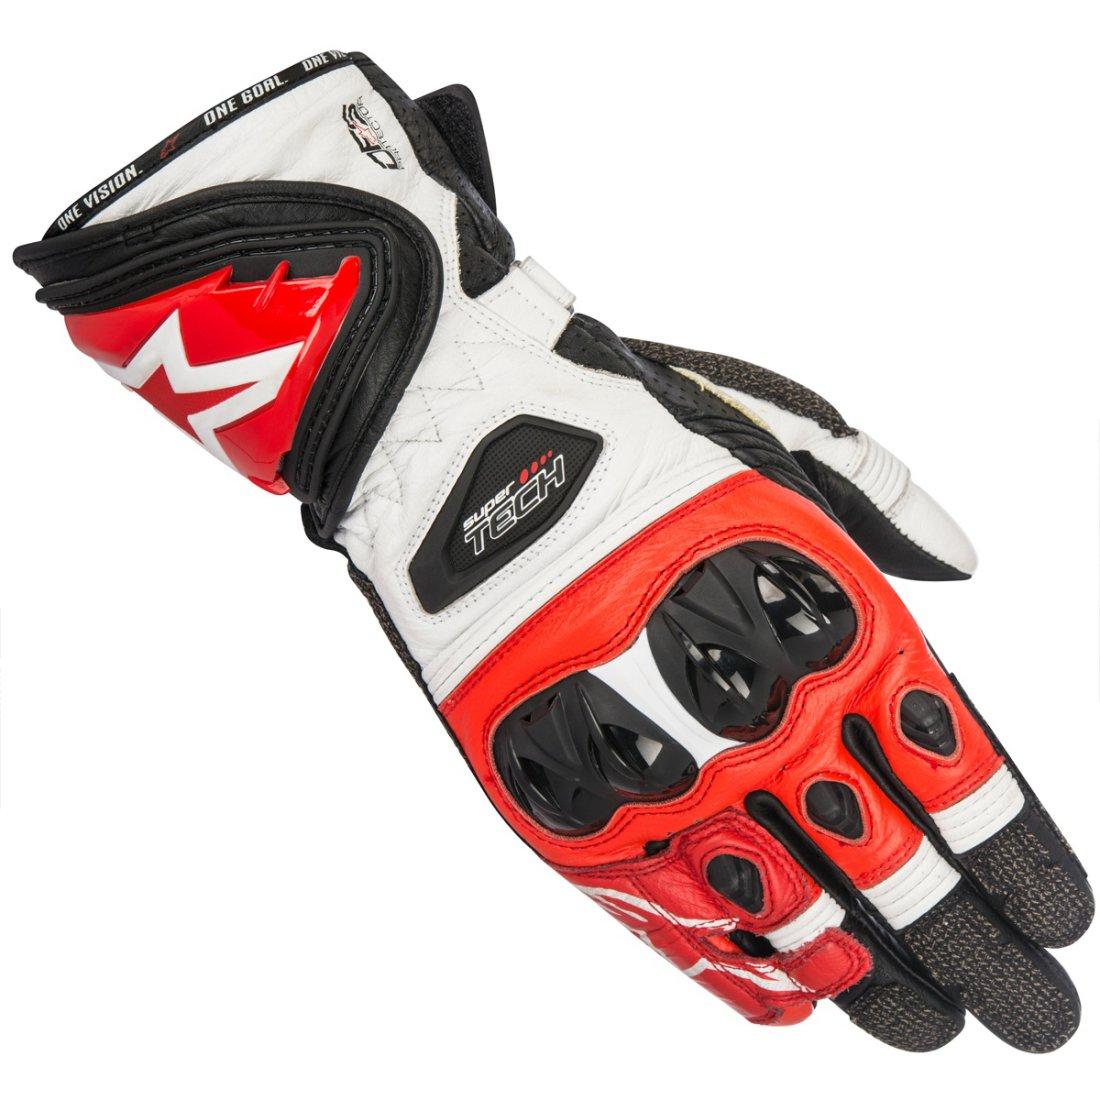 ALPINESTARS Supertech Black / White / Red Gloves